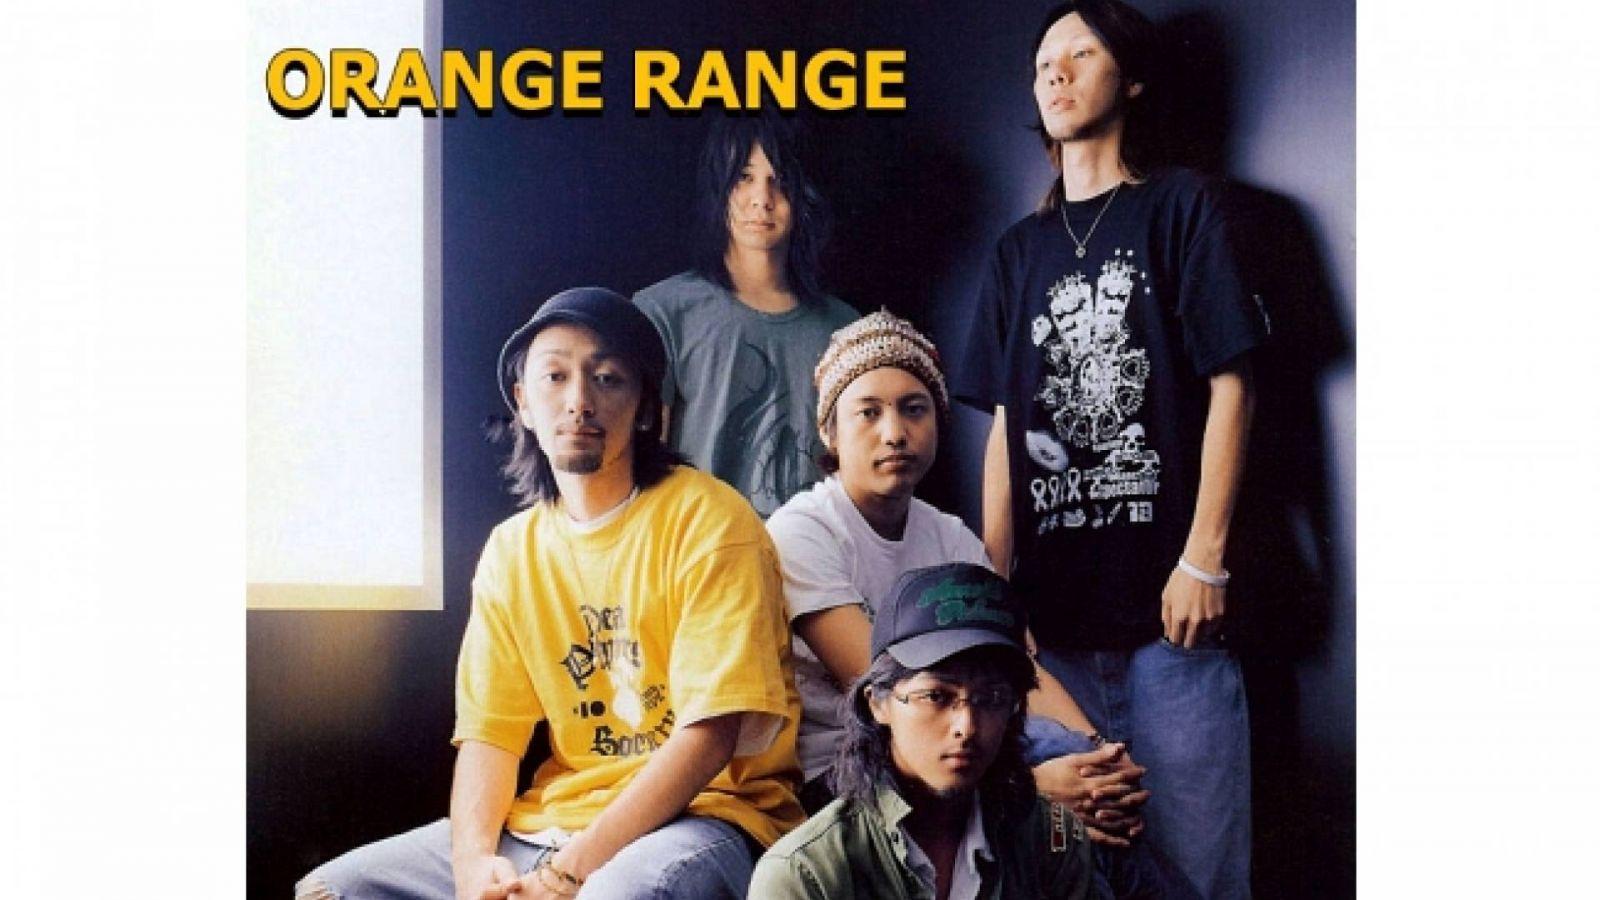 Novo single do ORANGE RANGE © Japan Files.com, Orange Range